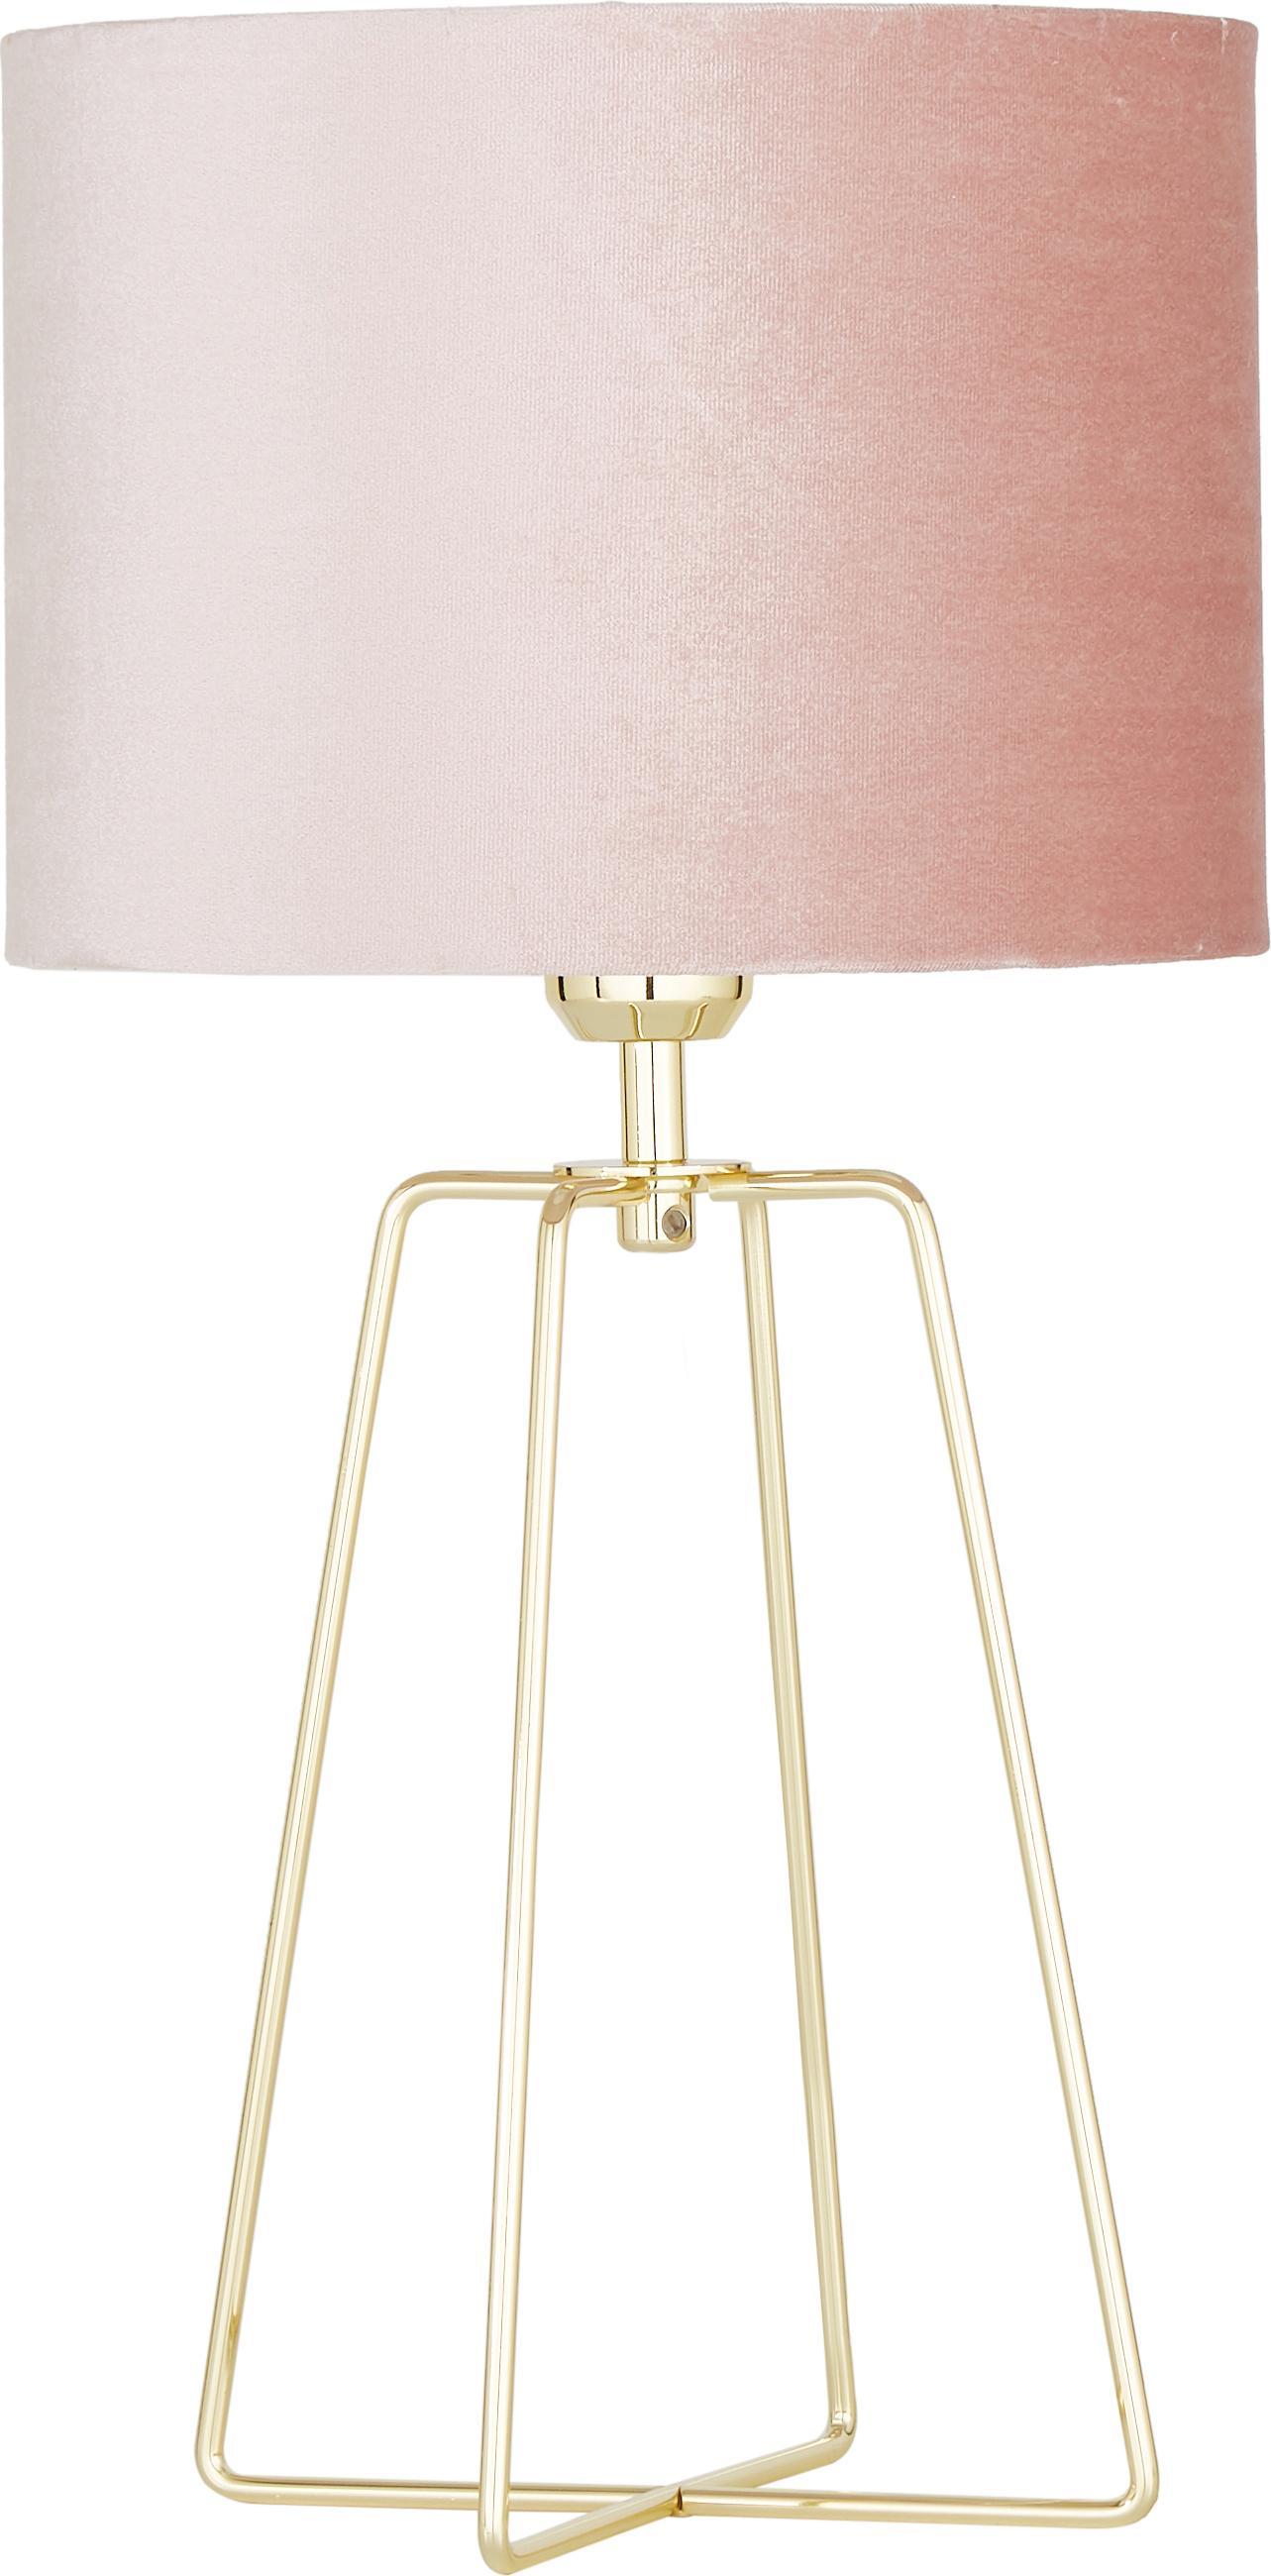 Lámpara de mesa de terciopelo Karolina, Pantalla: terciopelo, Cable: plástico, Rosa palo, latón brillante, Ø 25 x Al 49 cm